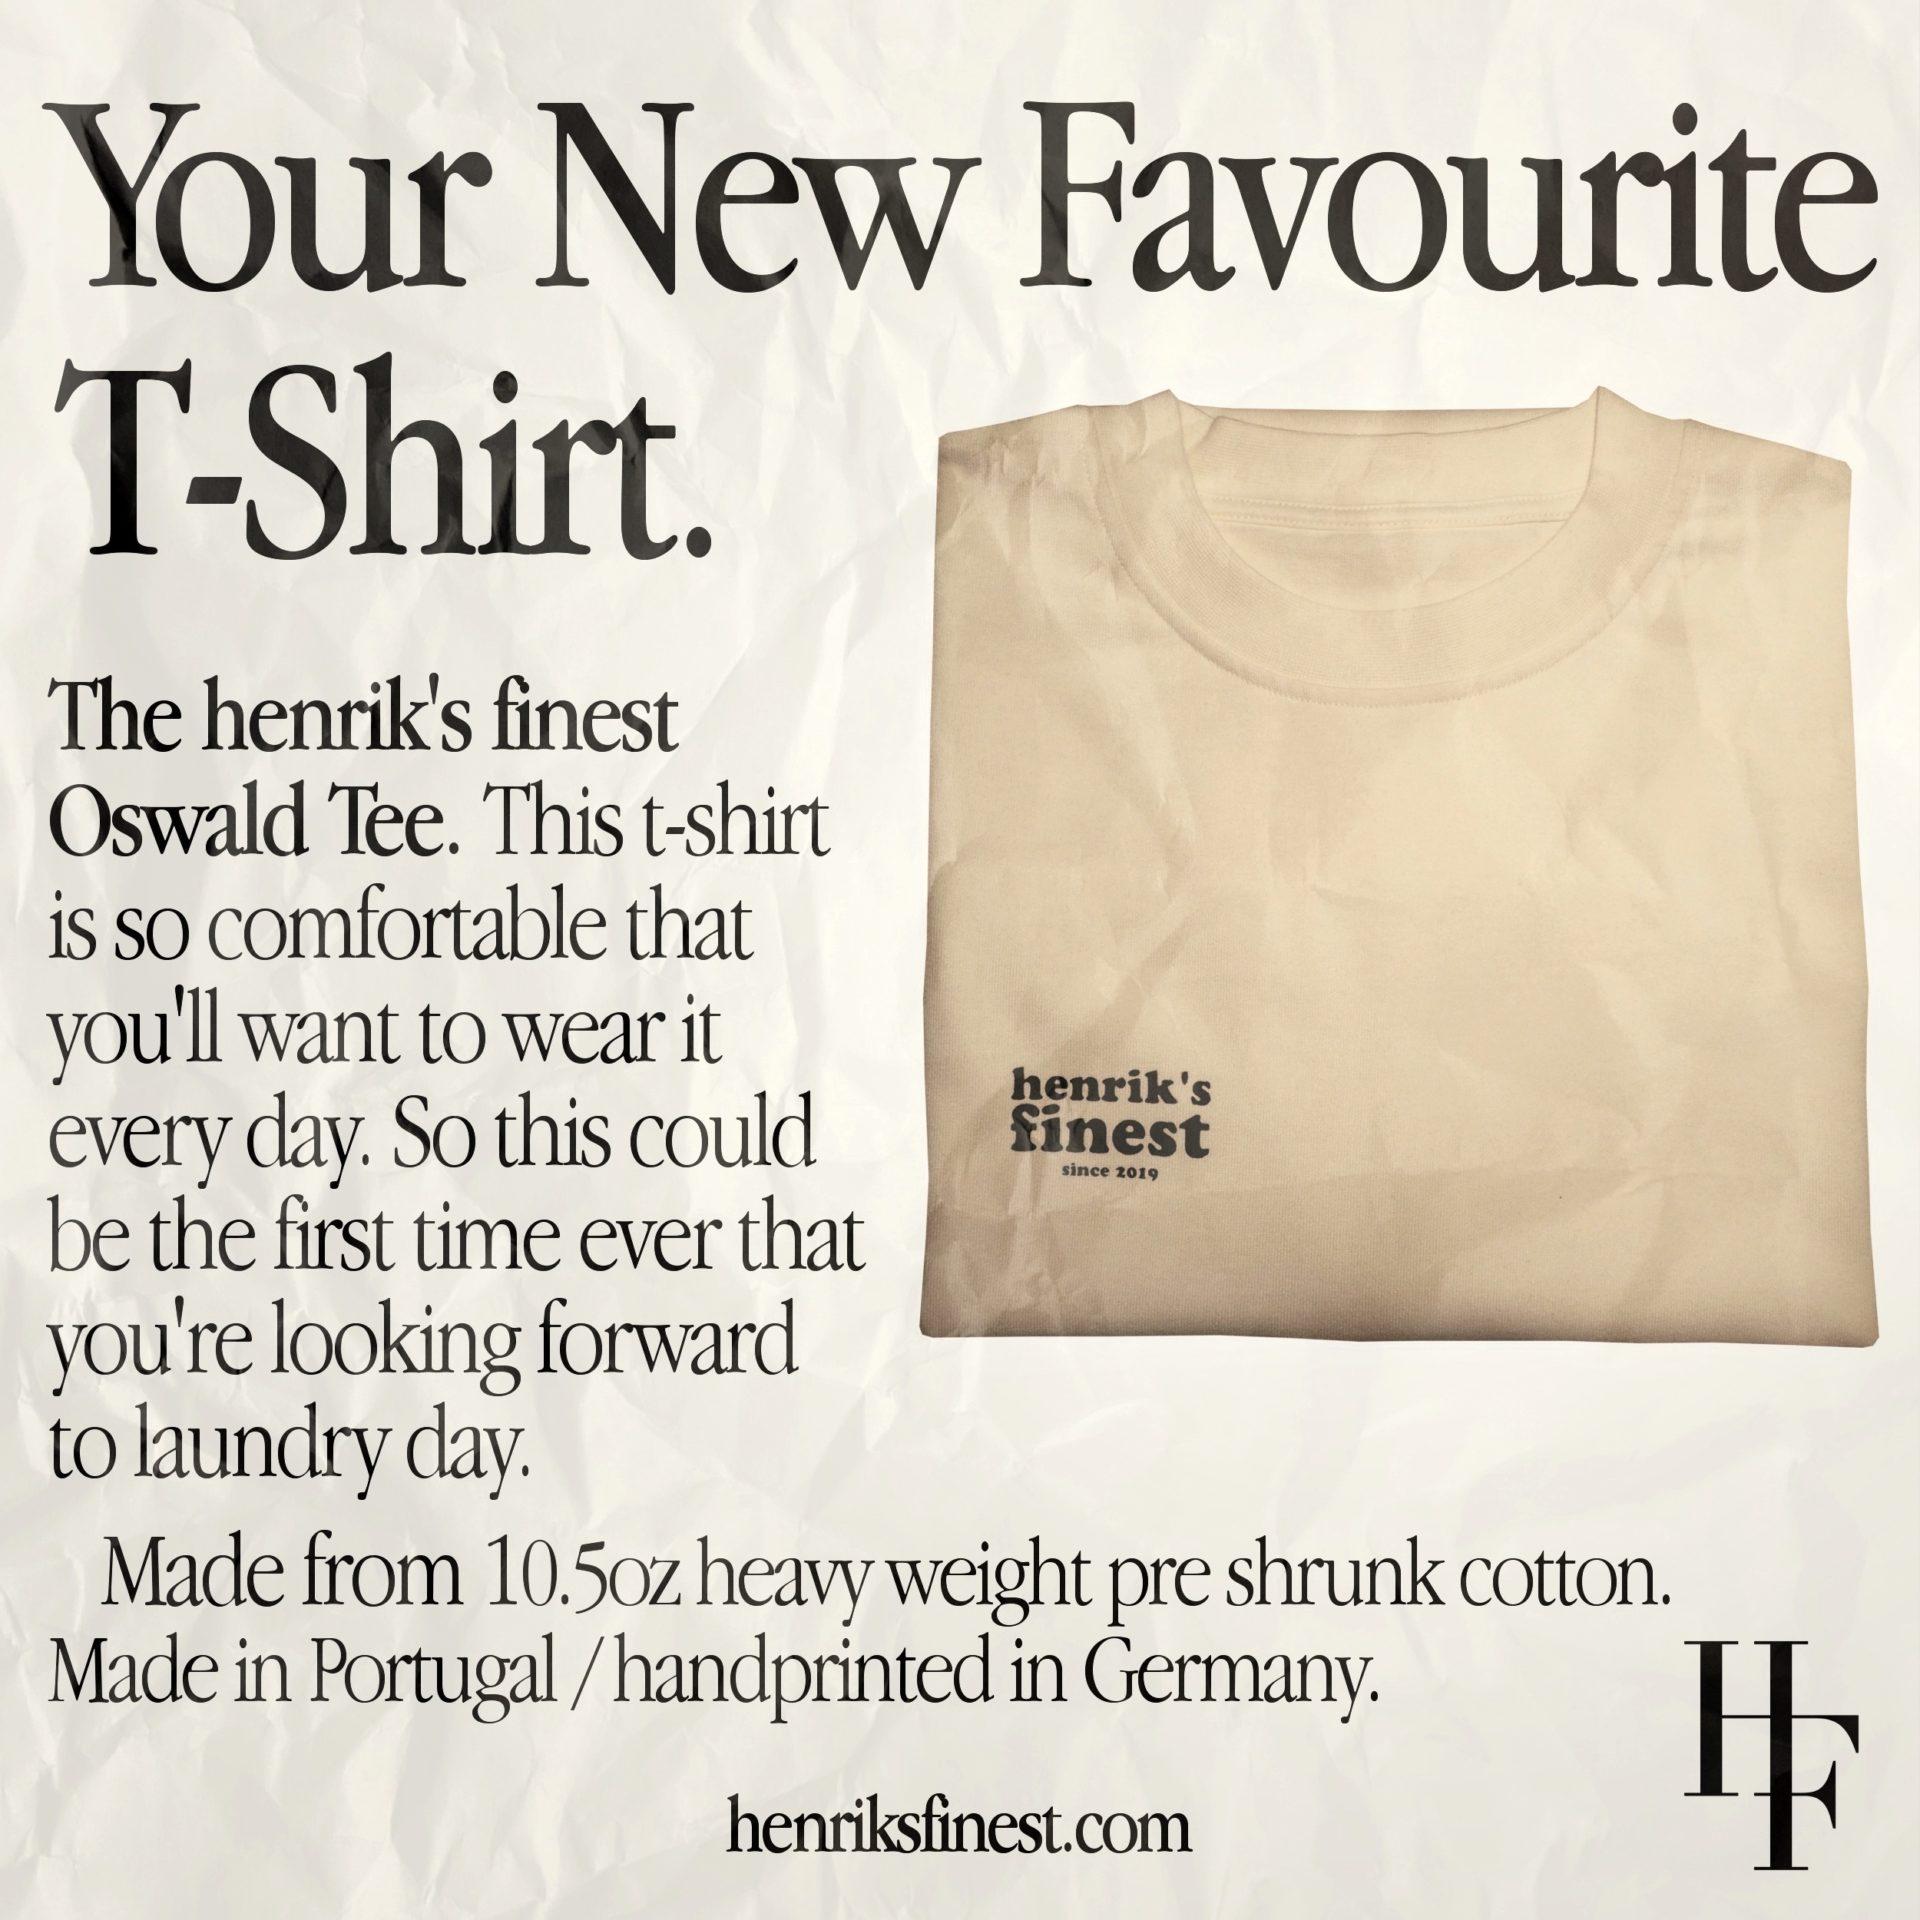 henrik's finest – Oswald Tee (vanilla/forest)